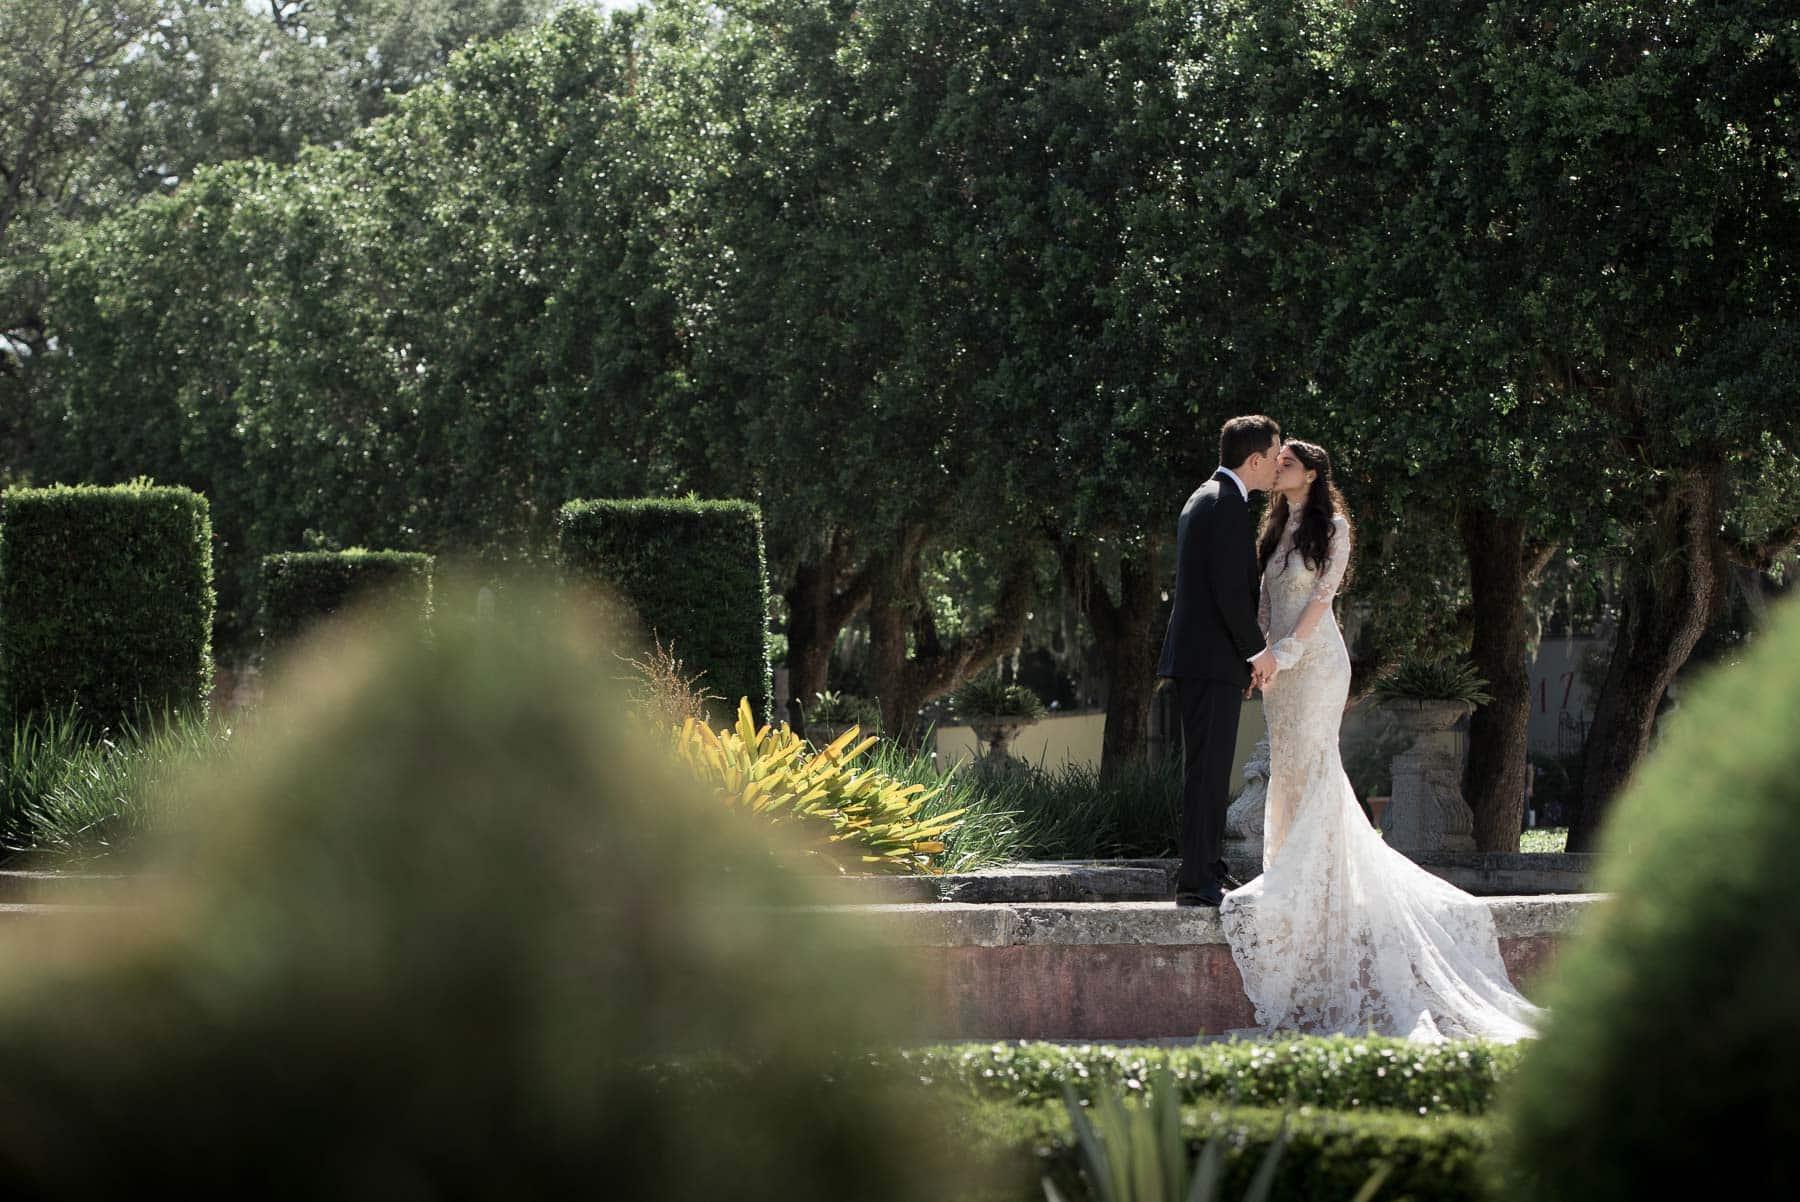 78-vizcaya-museum-wedding-photography.jpg